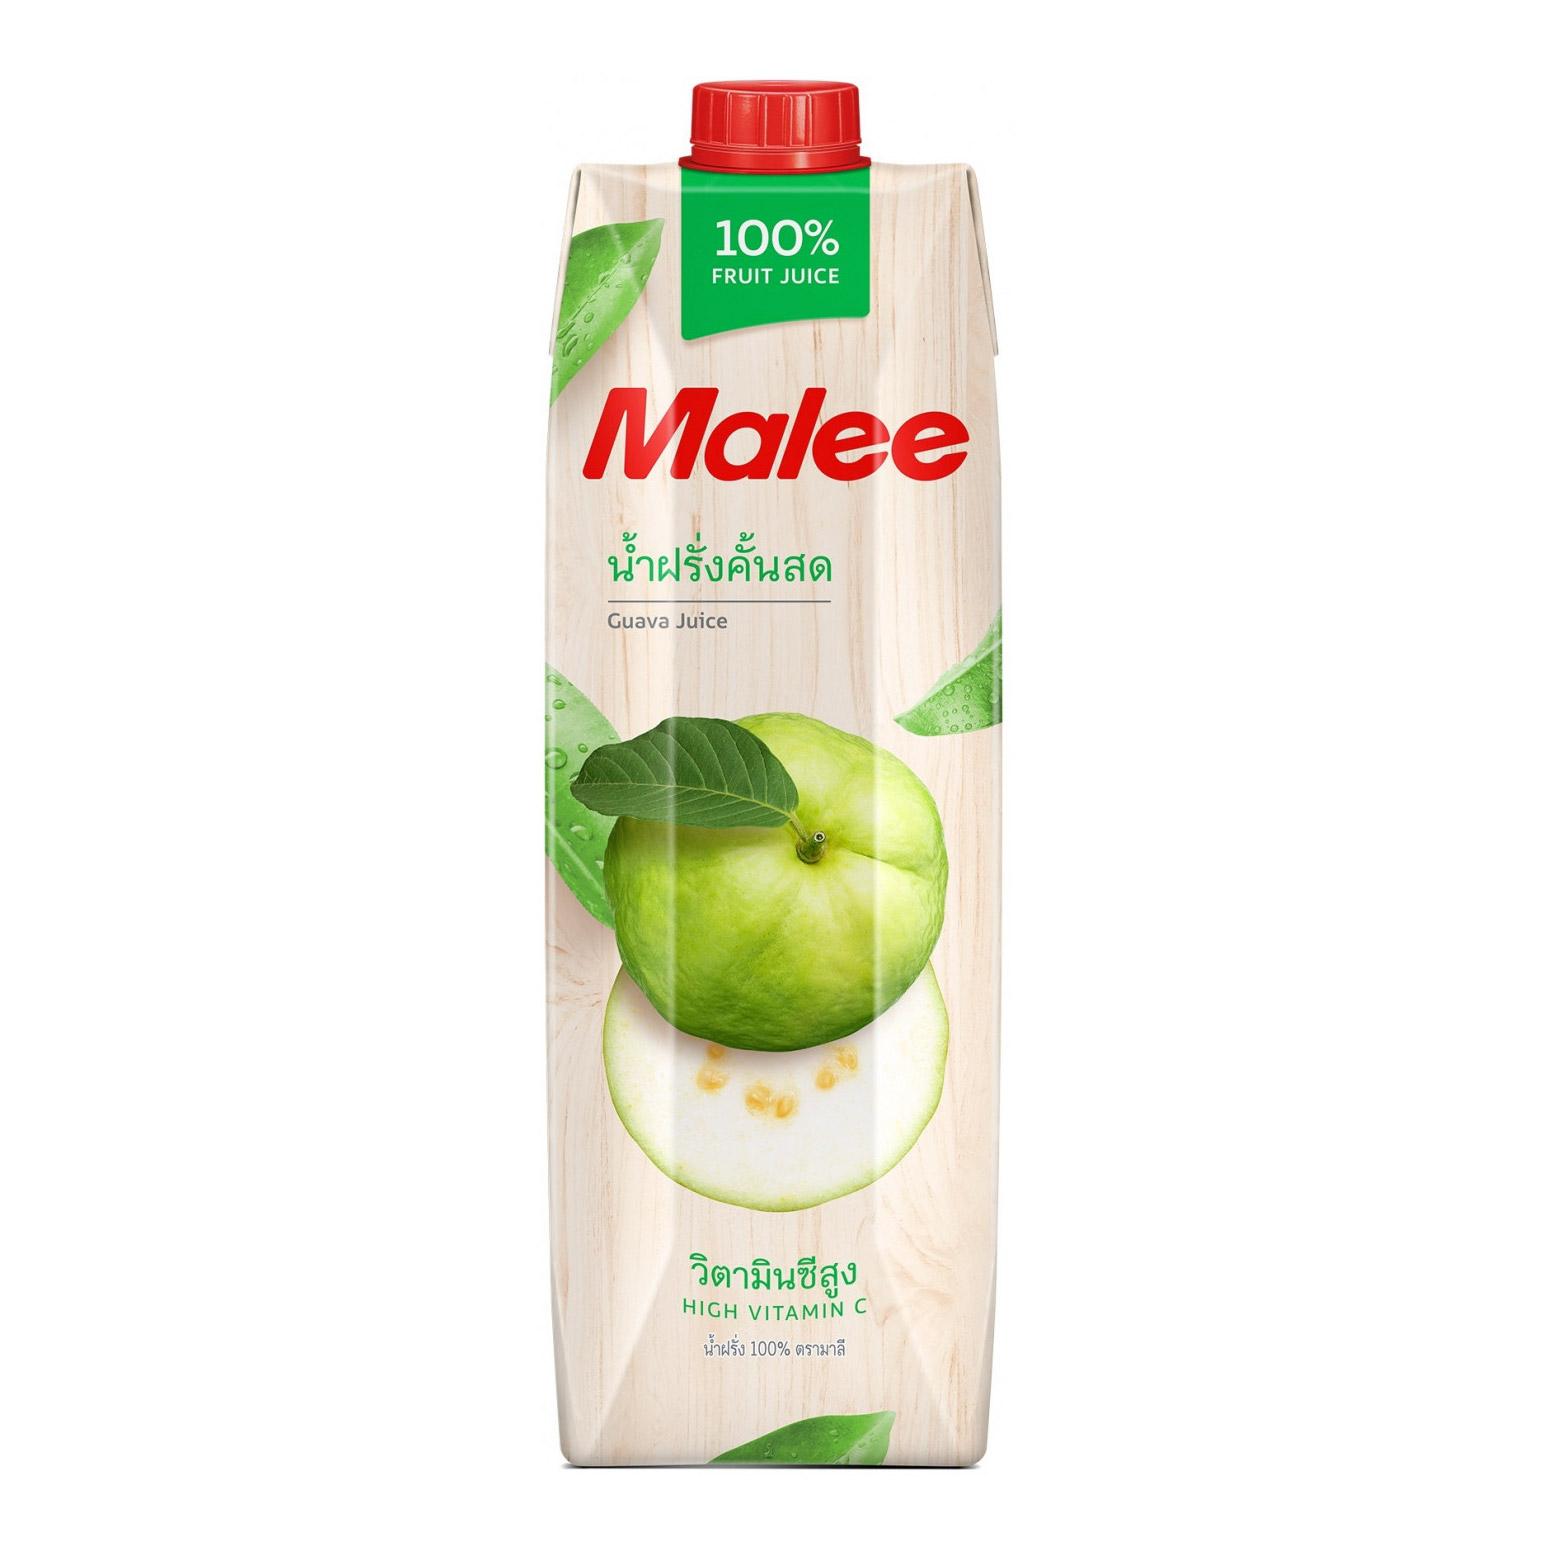 Cок Malee гуава прямого отжима 1 л malee напиток кокосовое молоко 0 33 л